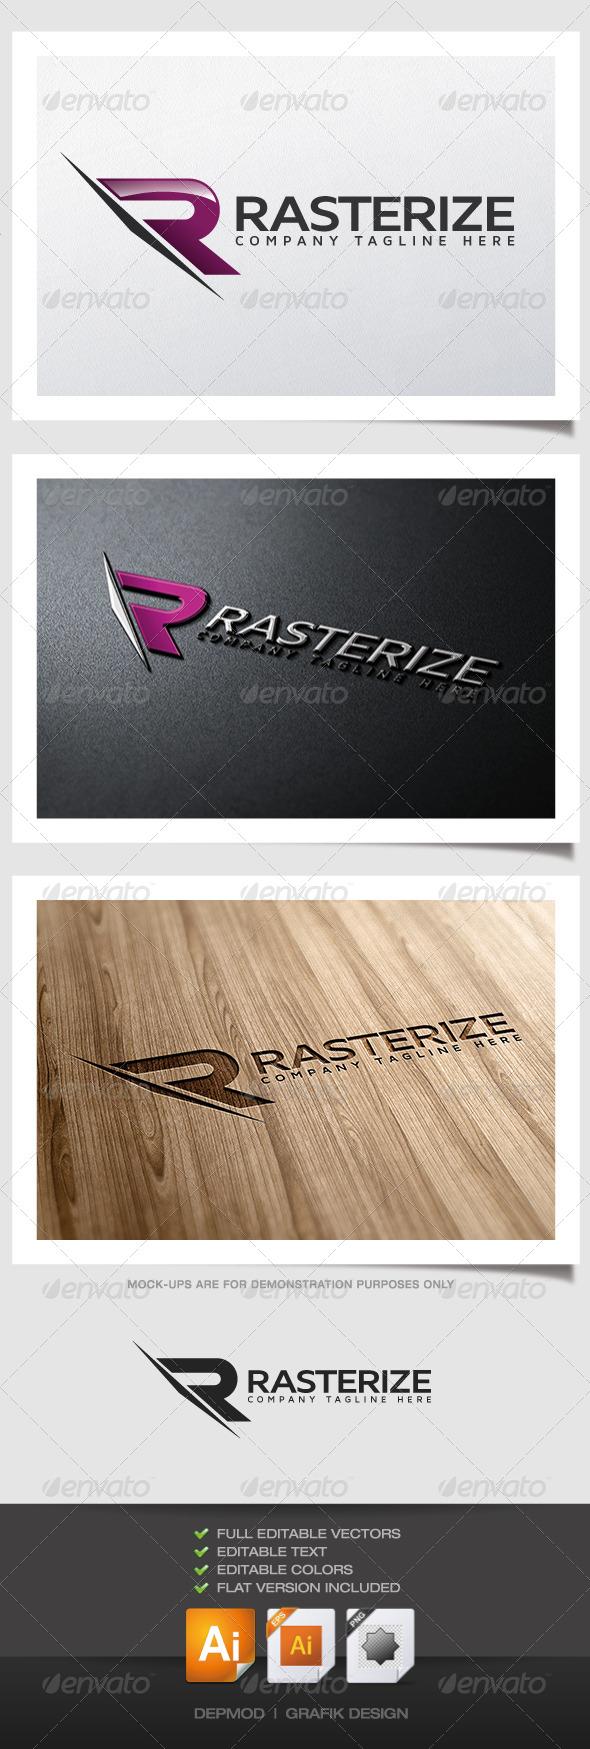 GraphicRiver Rasterize Logo 5164204